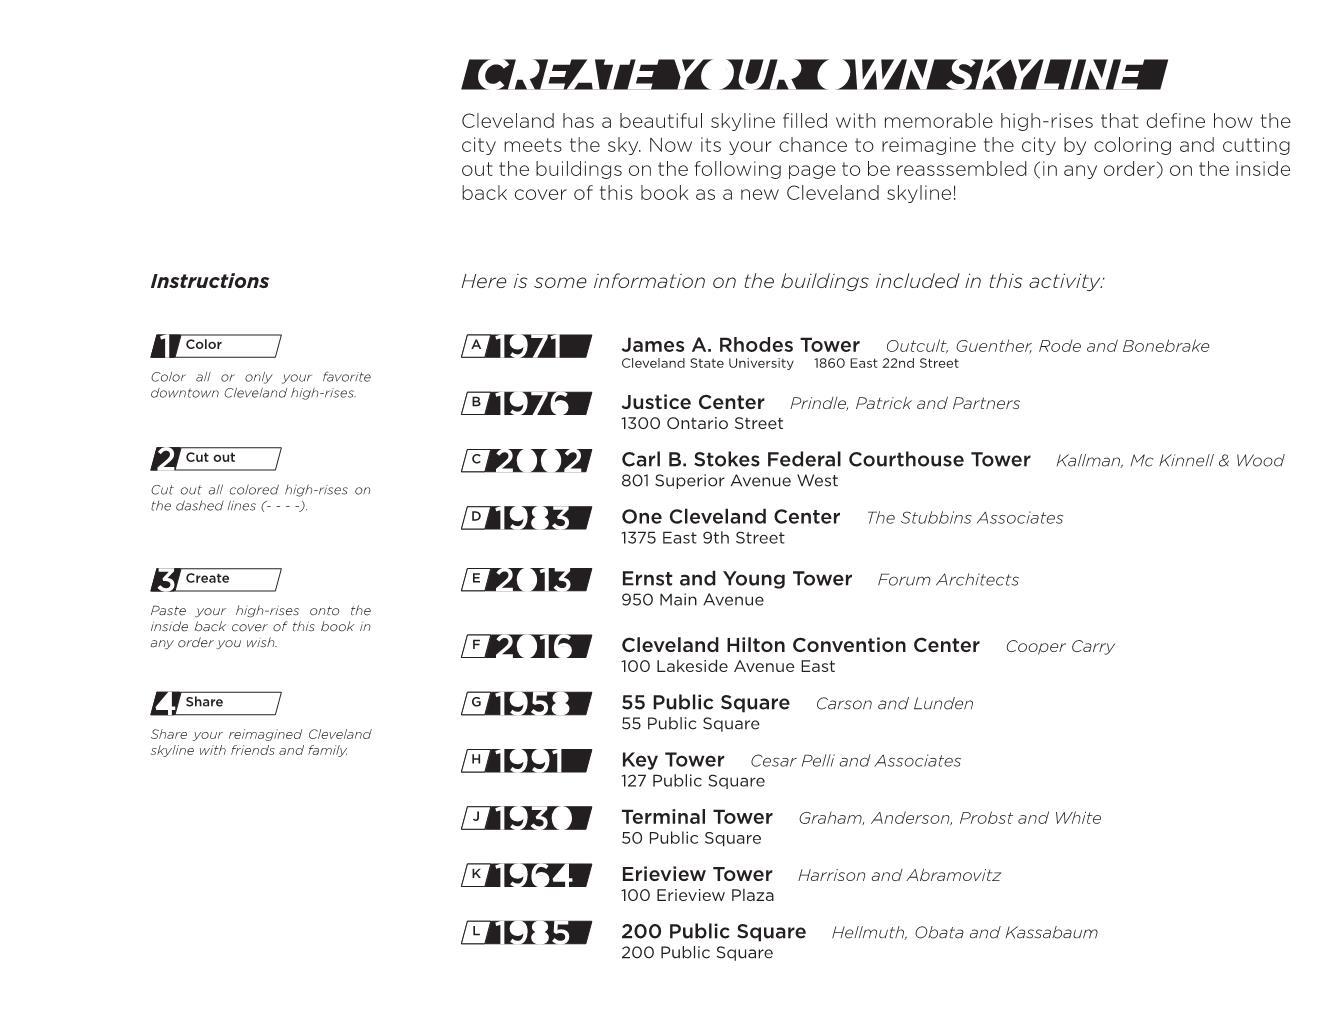 CACB v3 Page 029.jpg